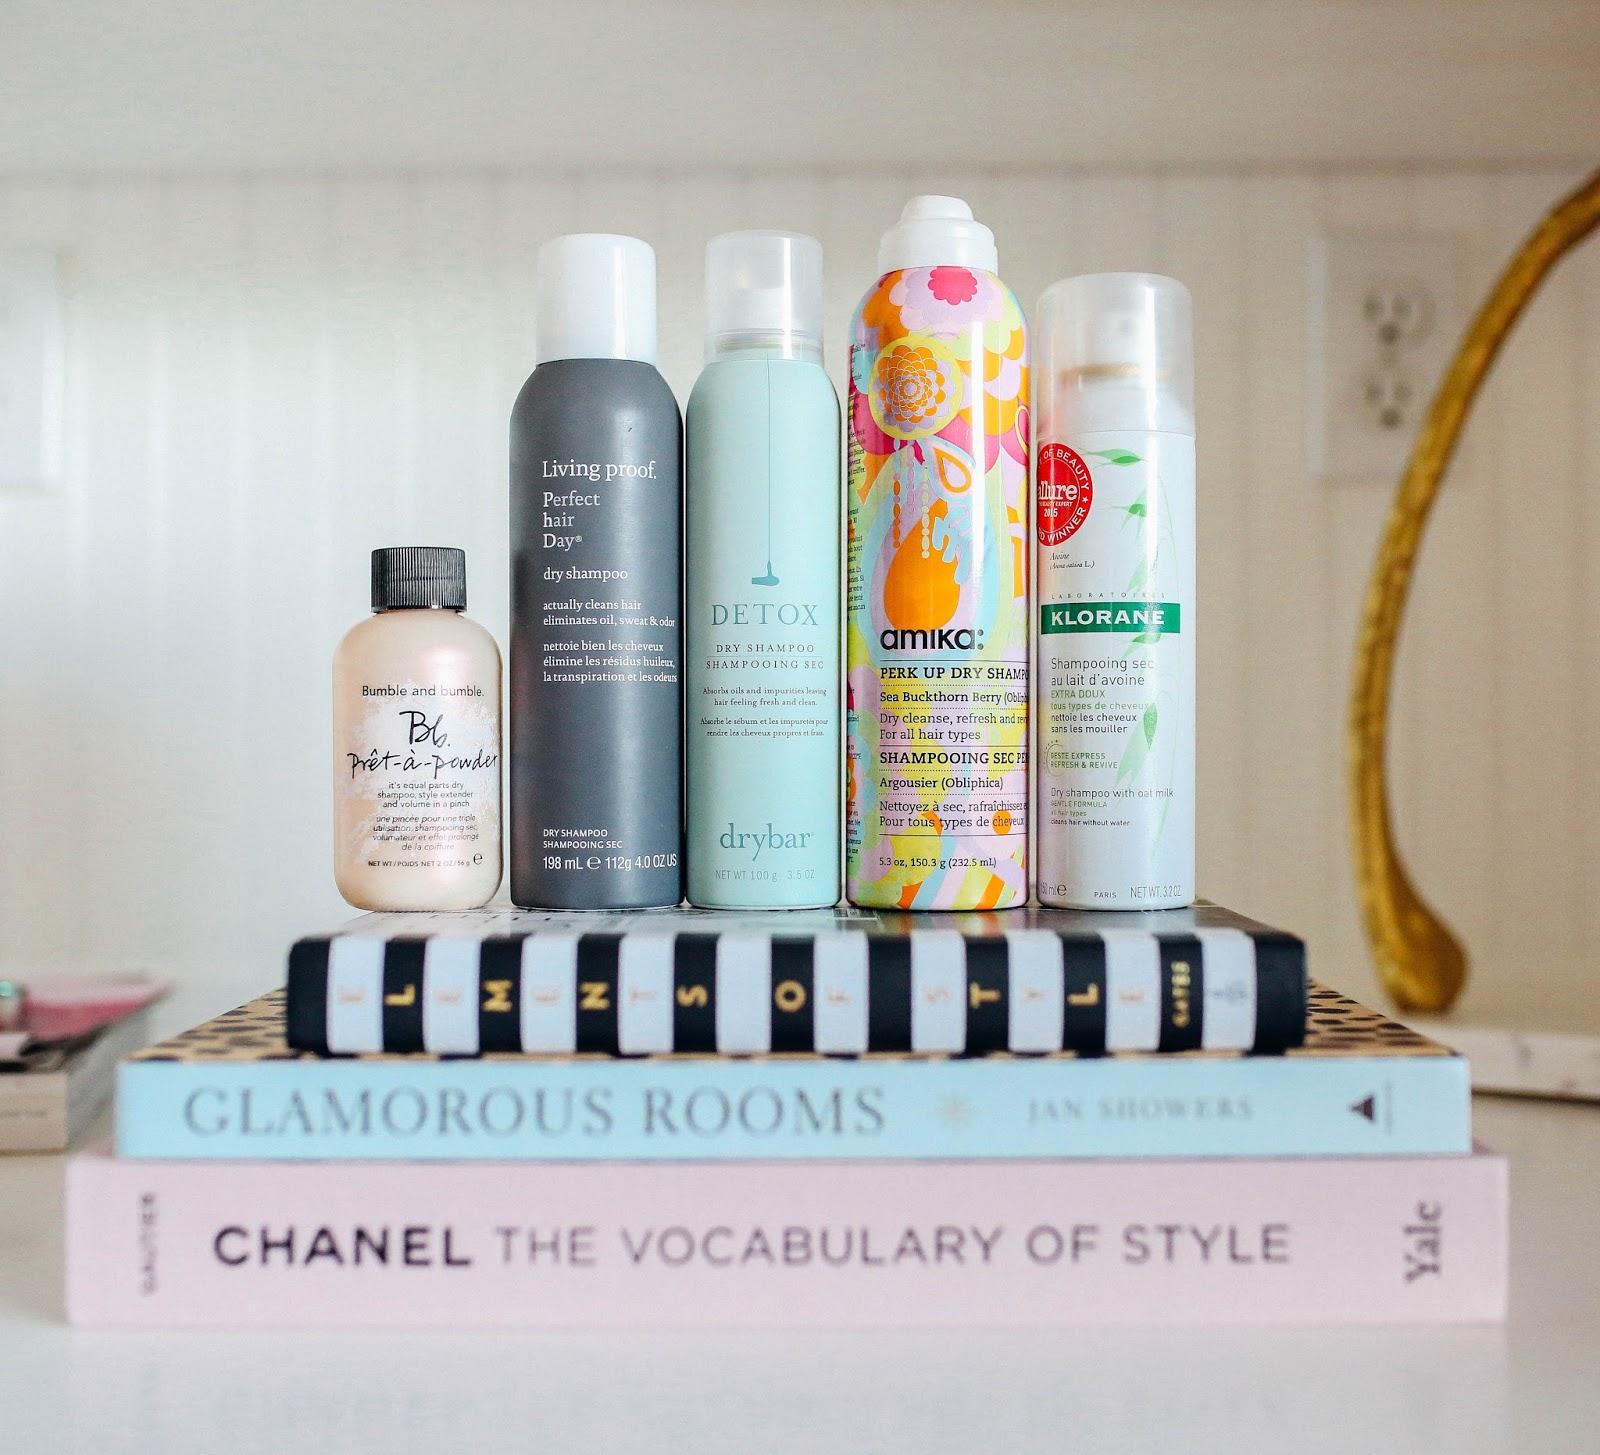 Klorane Dry Shampoo The Best Of Dry Shampoo How I Use Dry Shampoo The Sweetest Thing